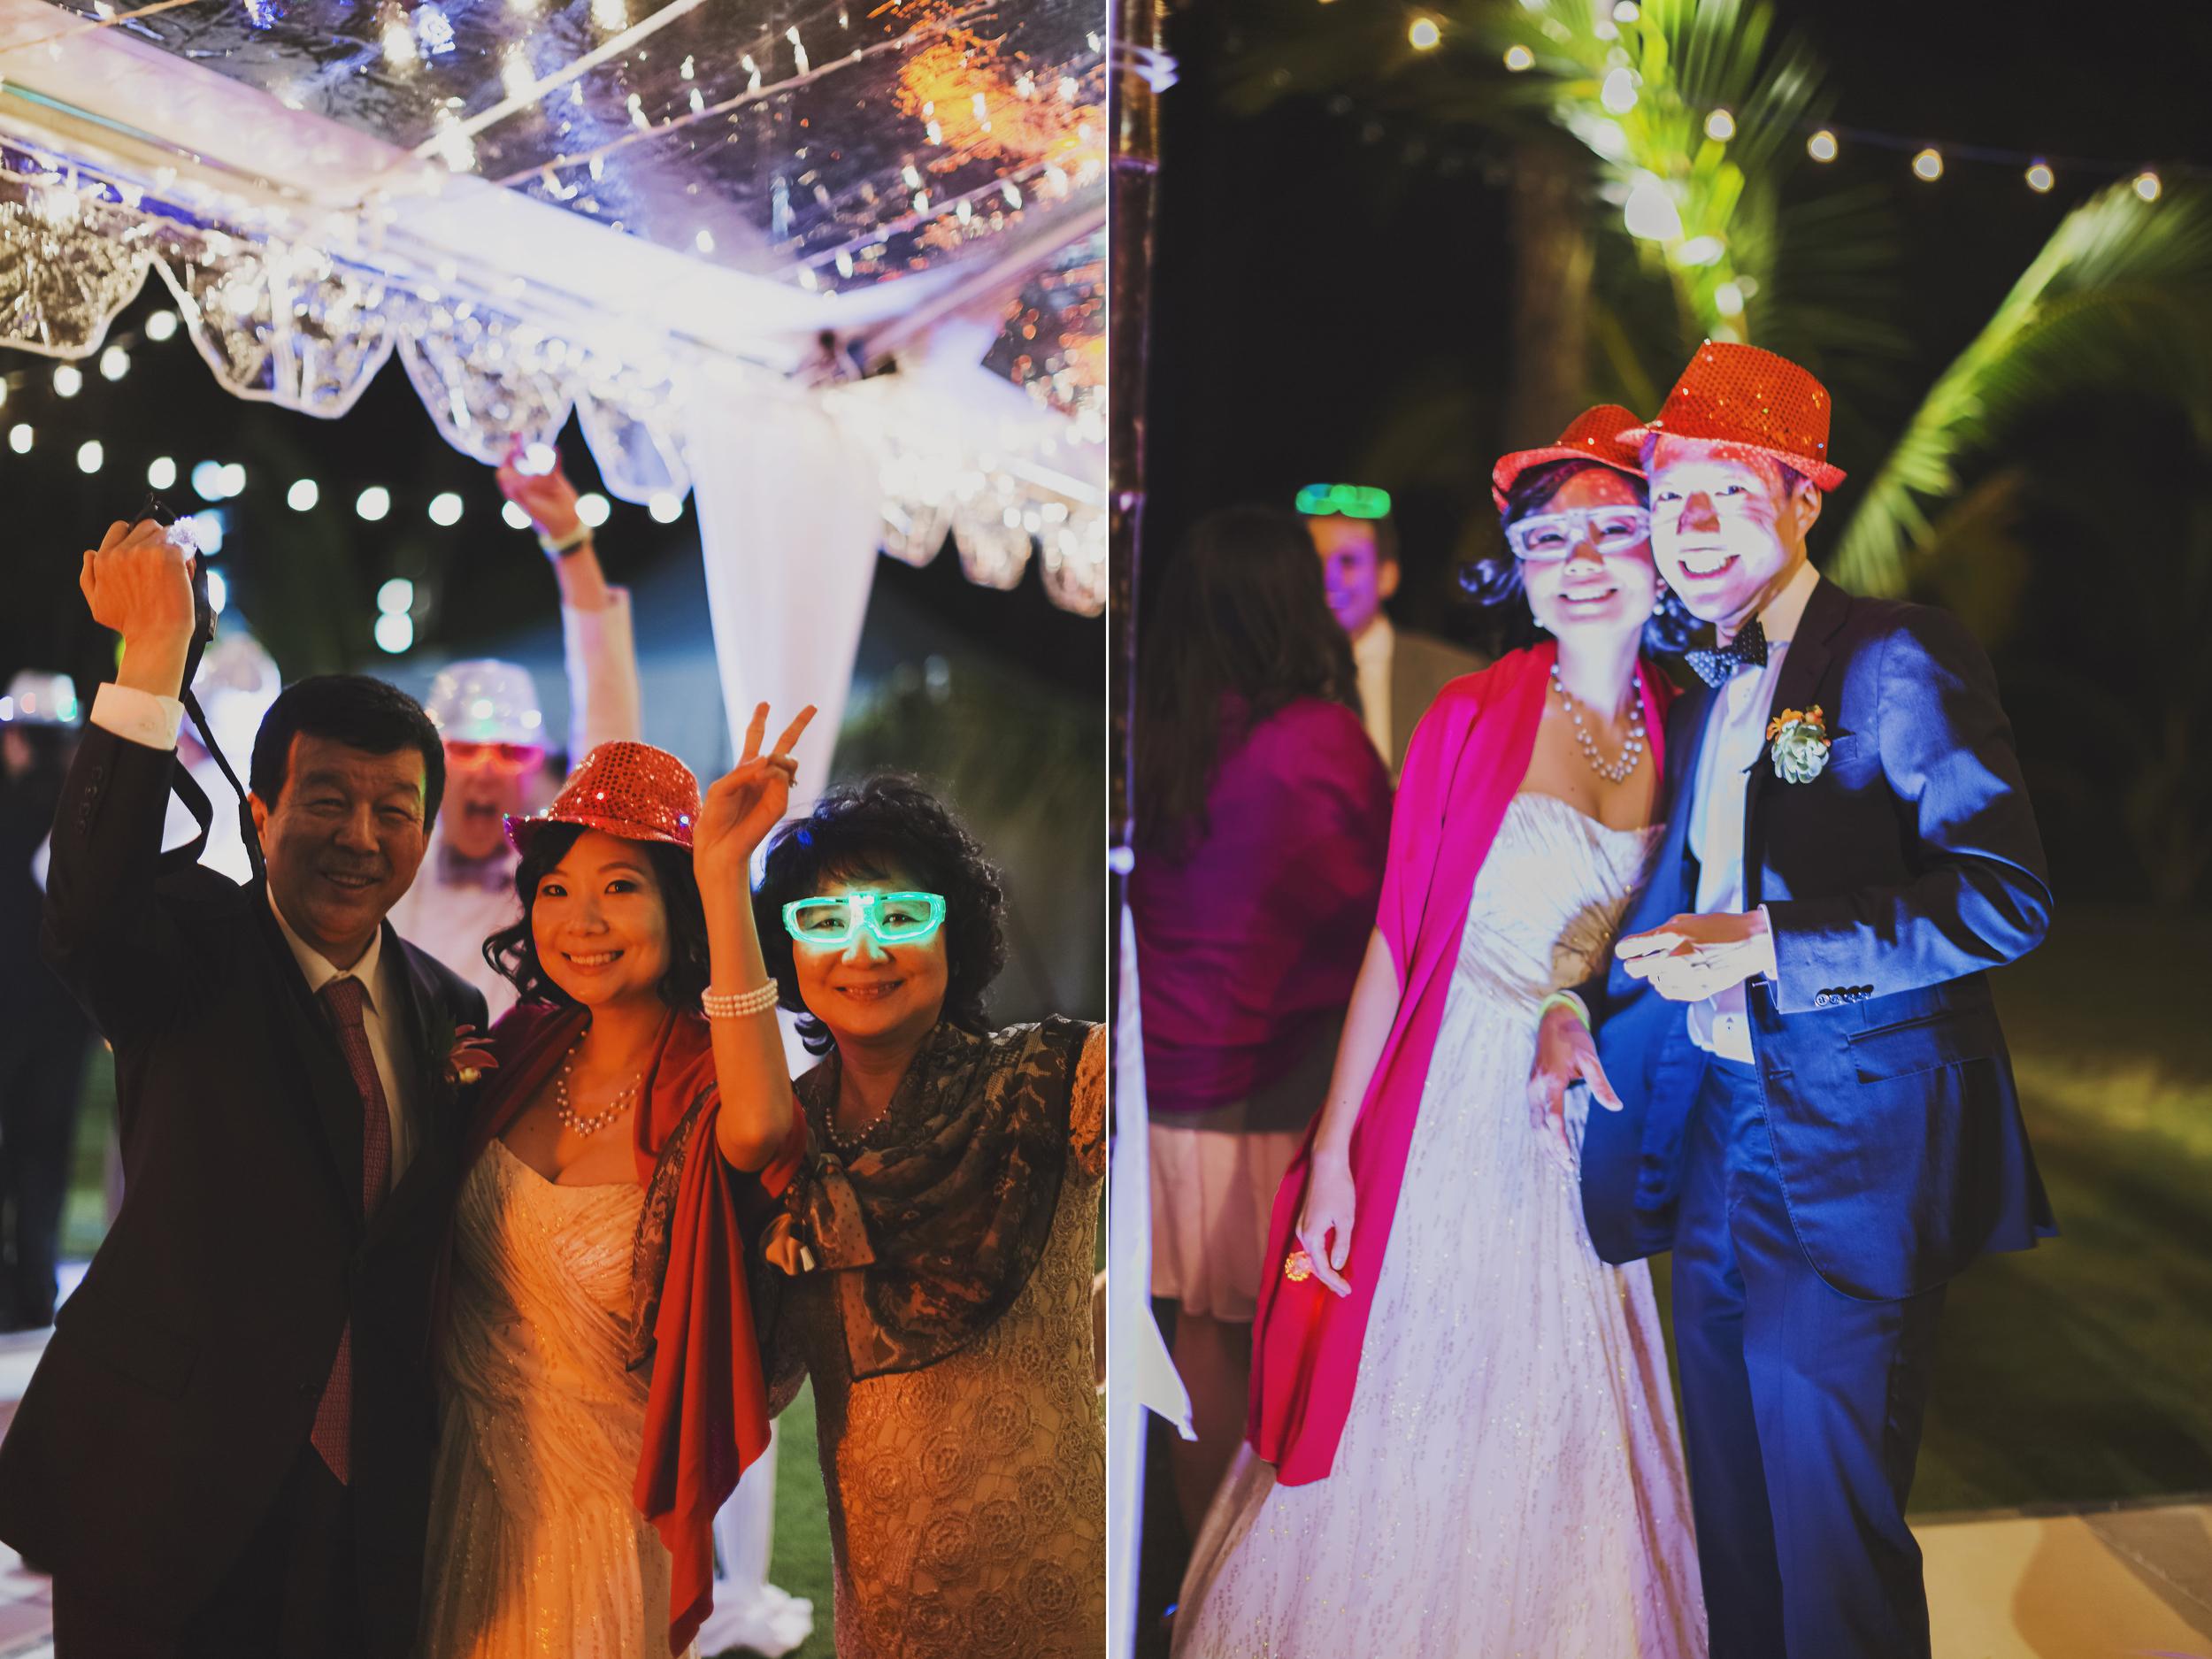 angie-diaz-photography-oahu-wedding-lanikuhonoa-shenshen-marshall-64.jpg